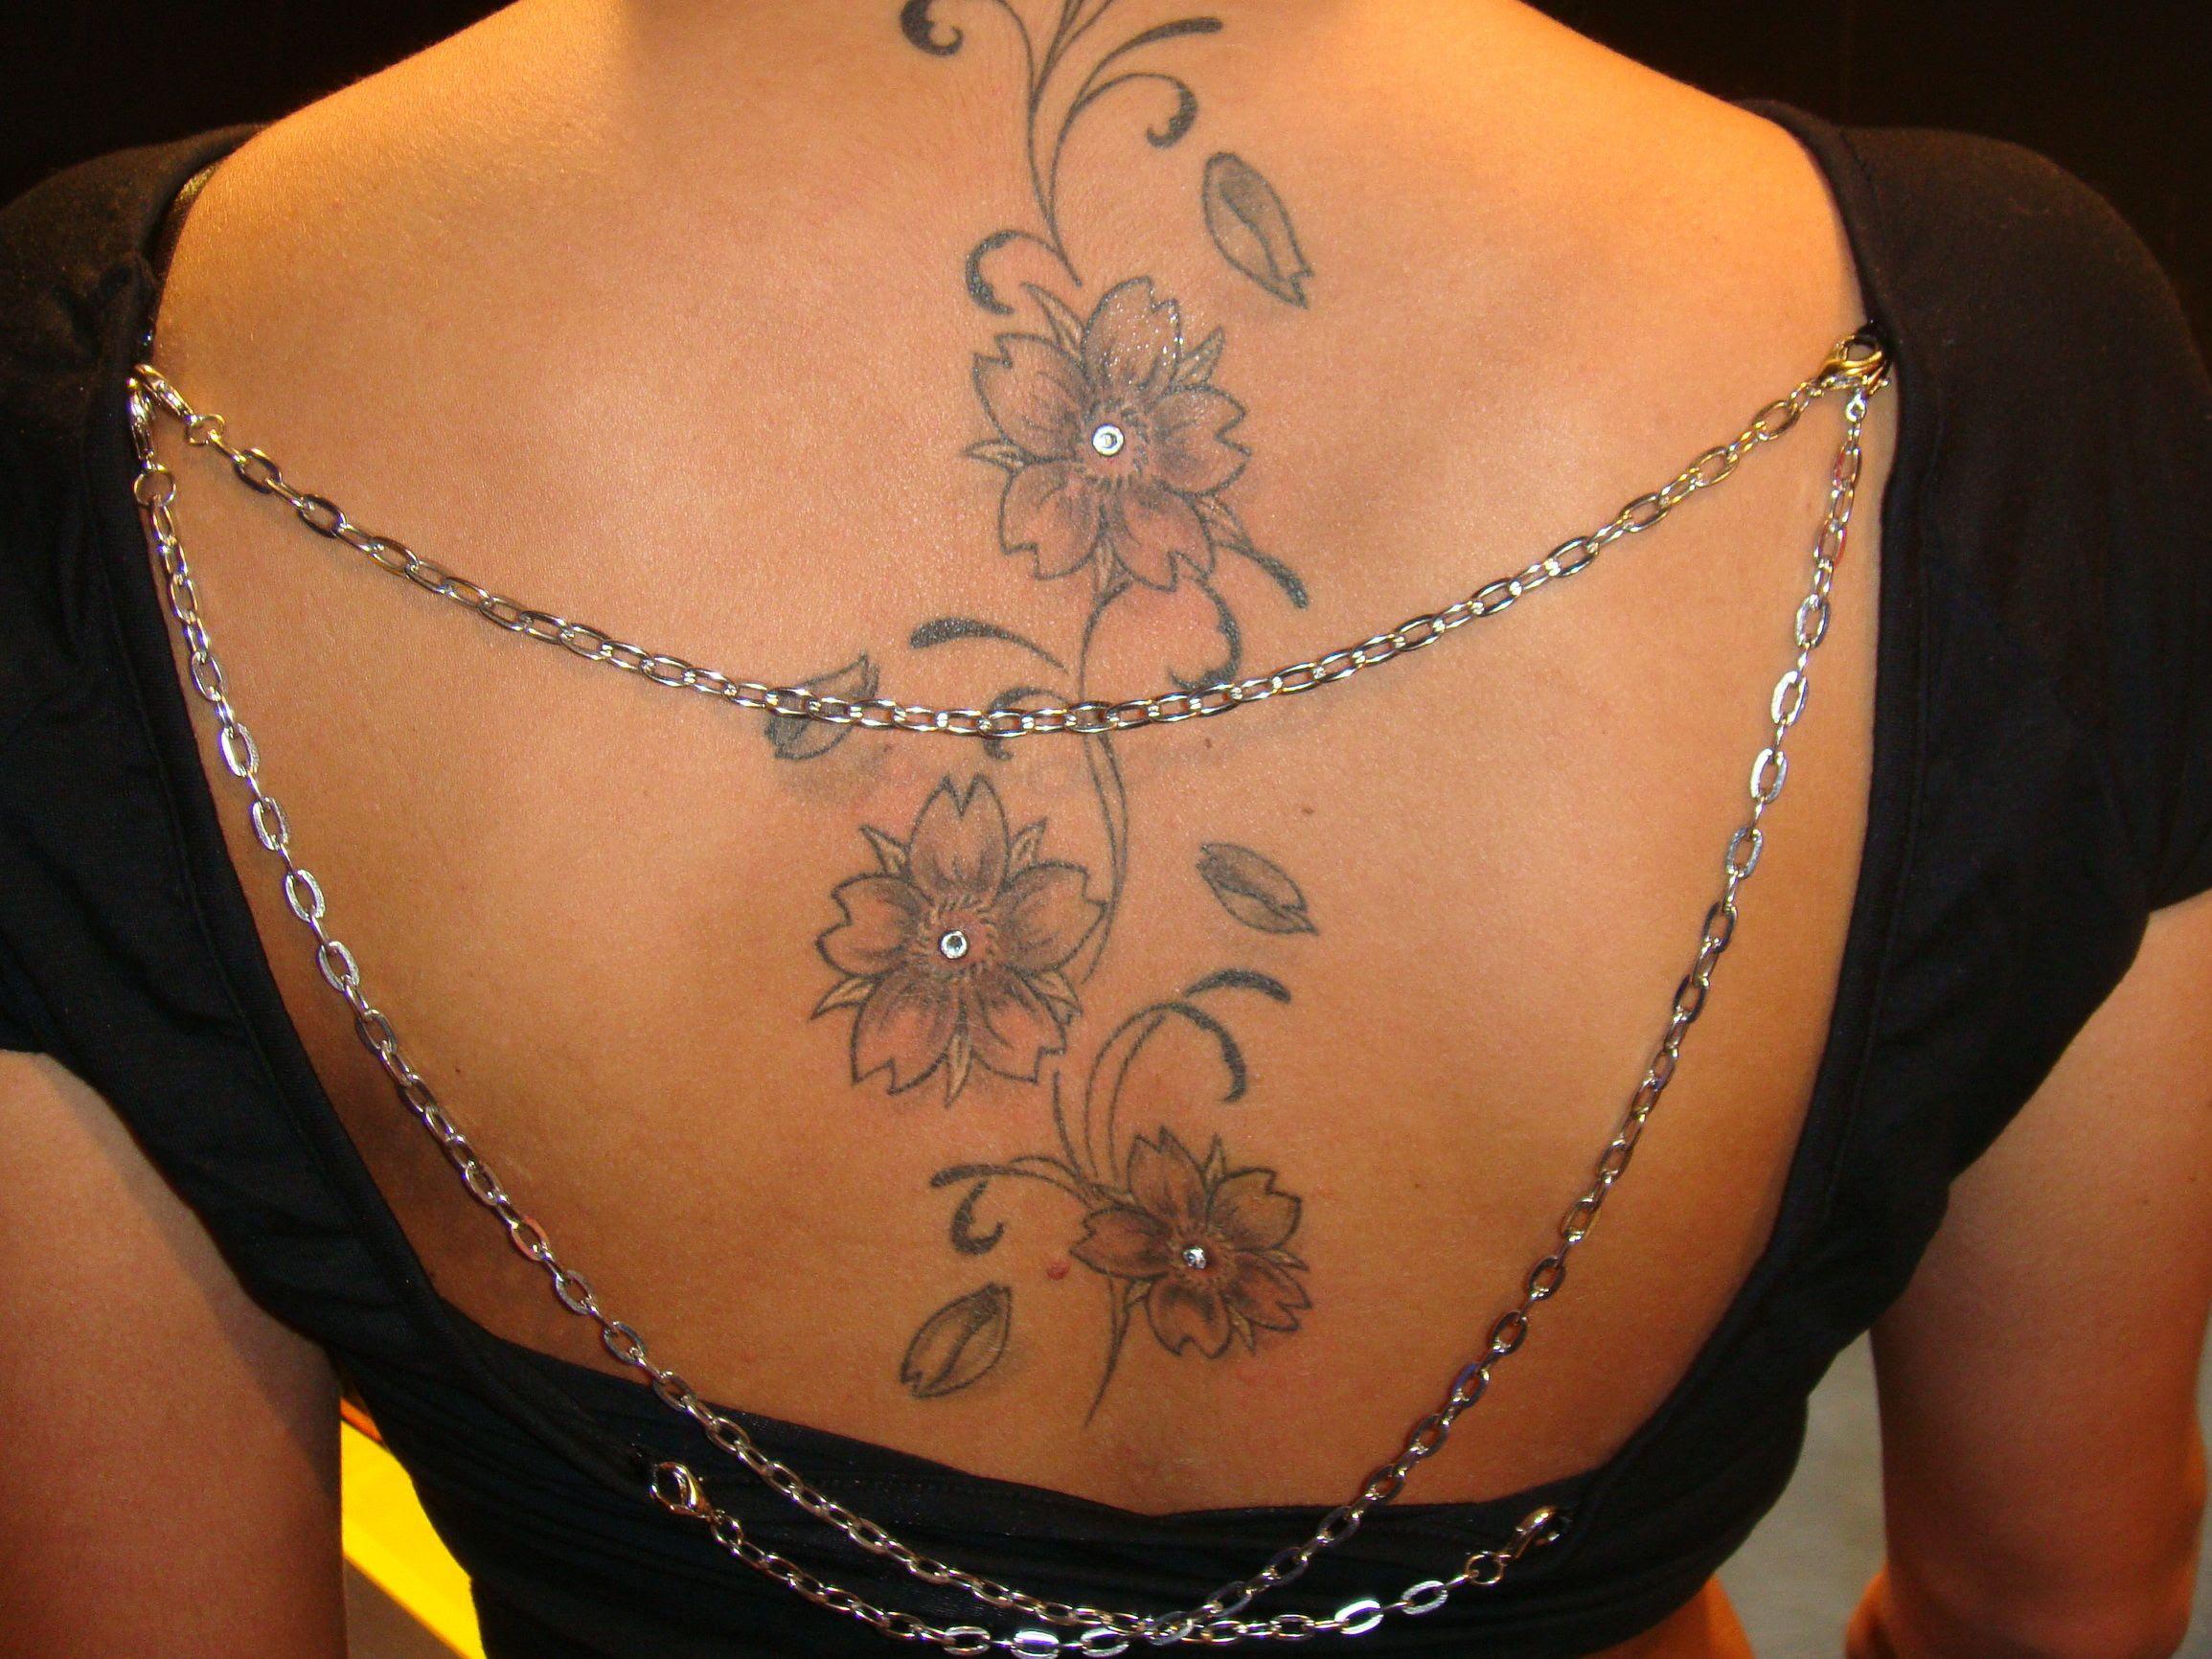 Tattoo Intimbereich